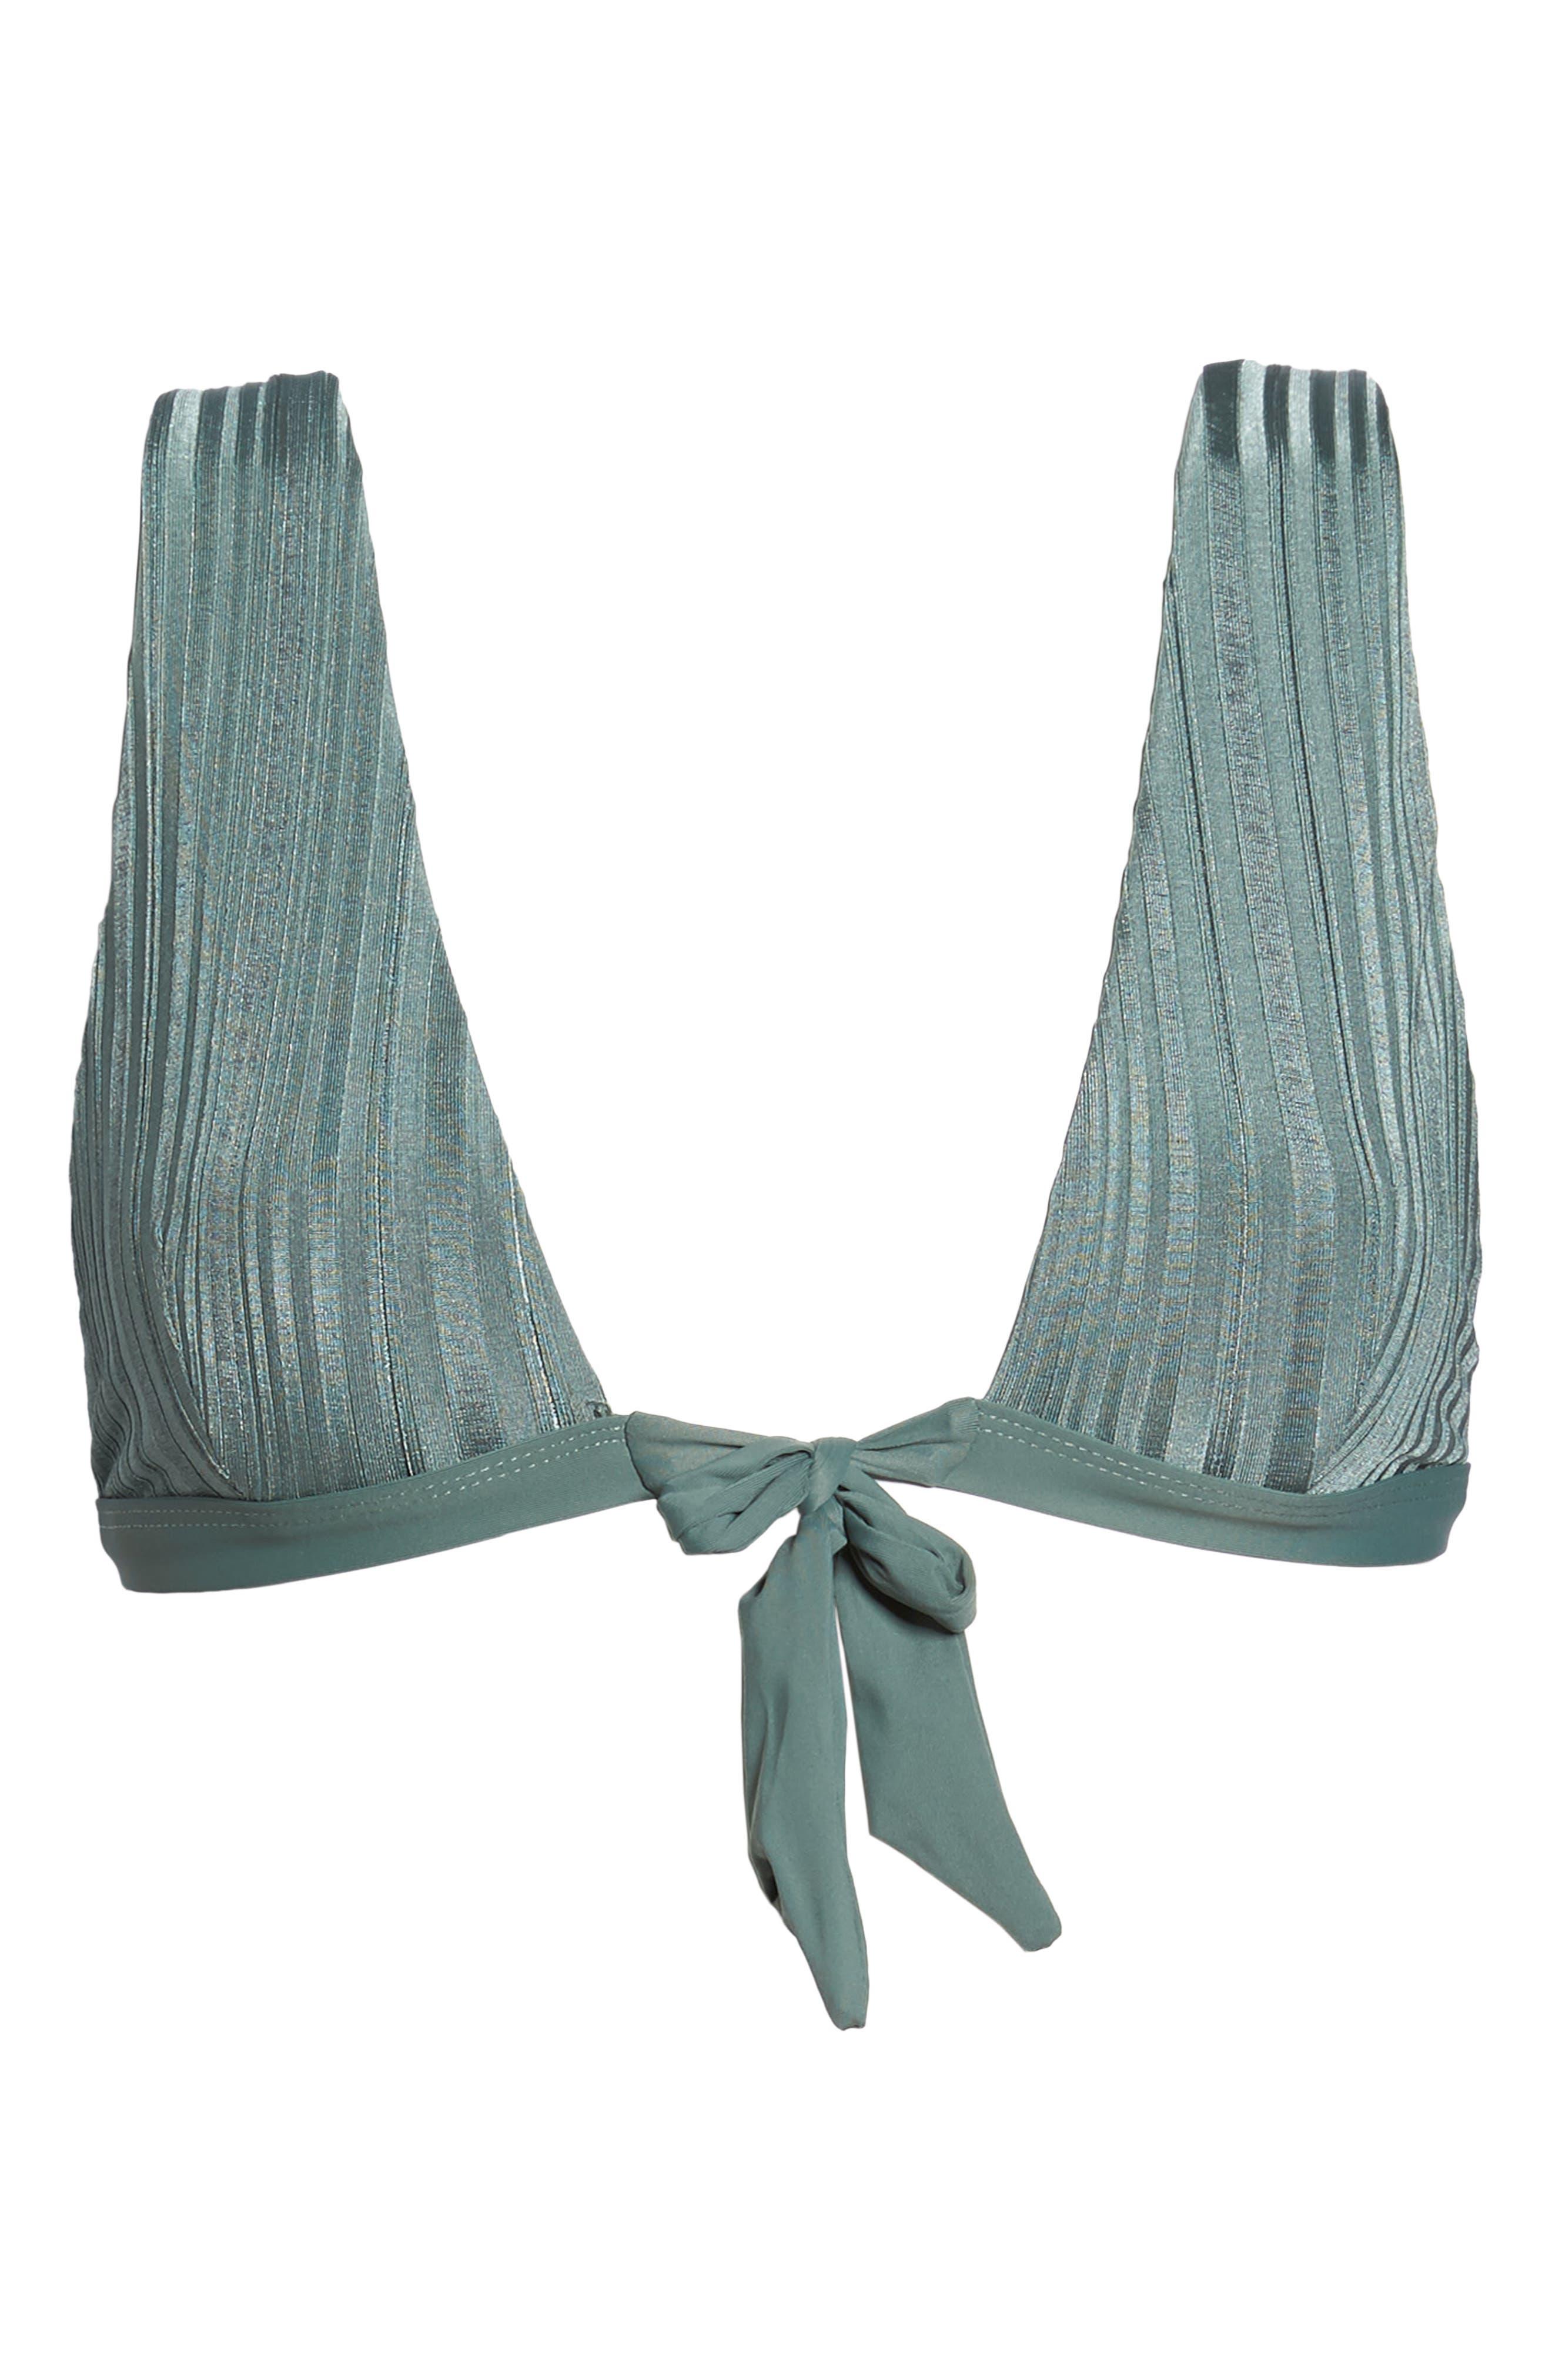 TAVIK, Caroline Bikini Top, Alternate thumbnail 7, color, MEADOW GREEN